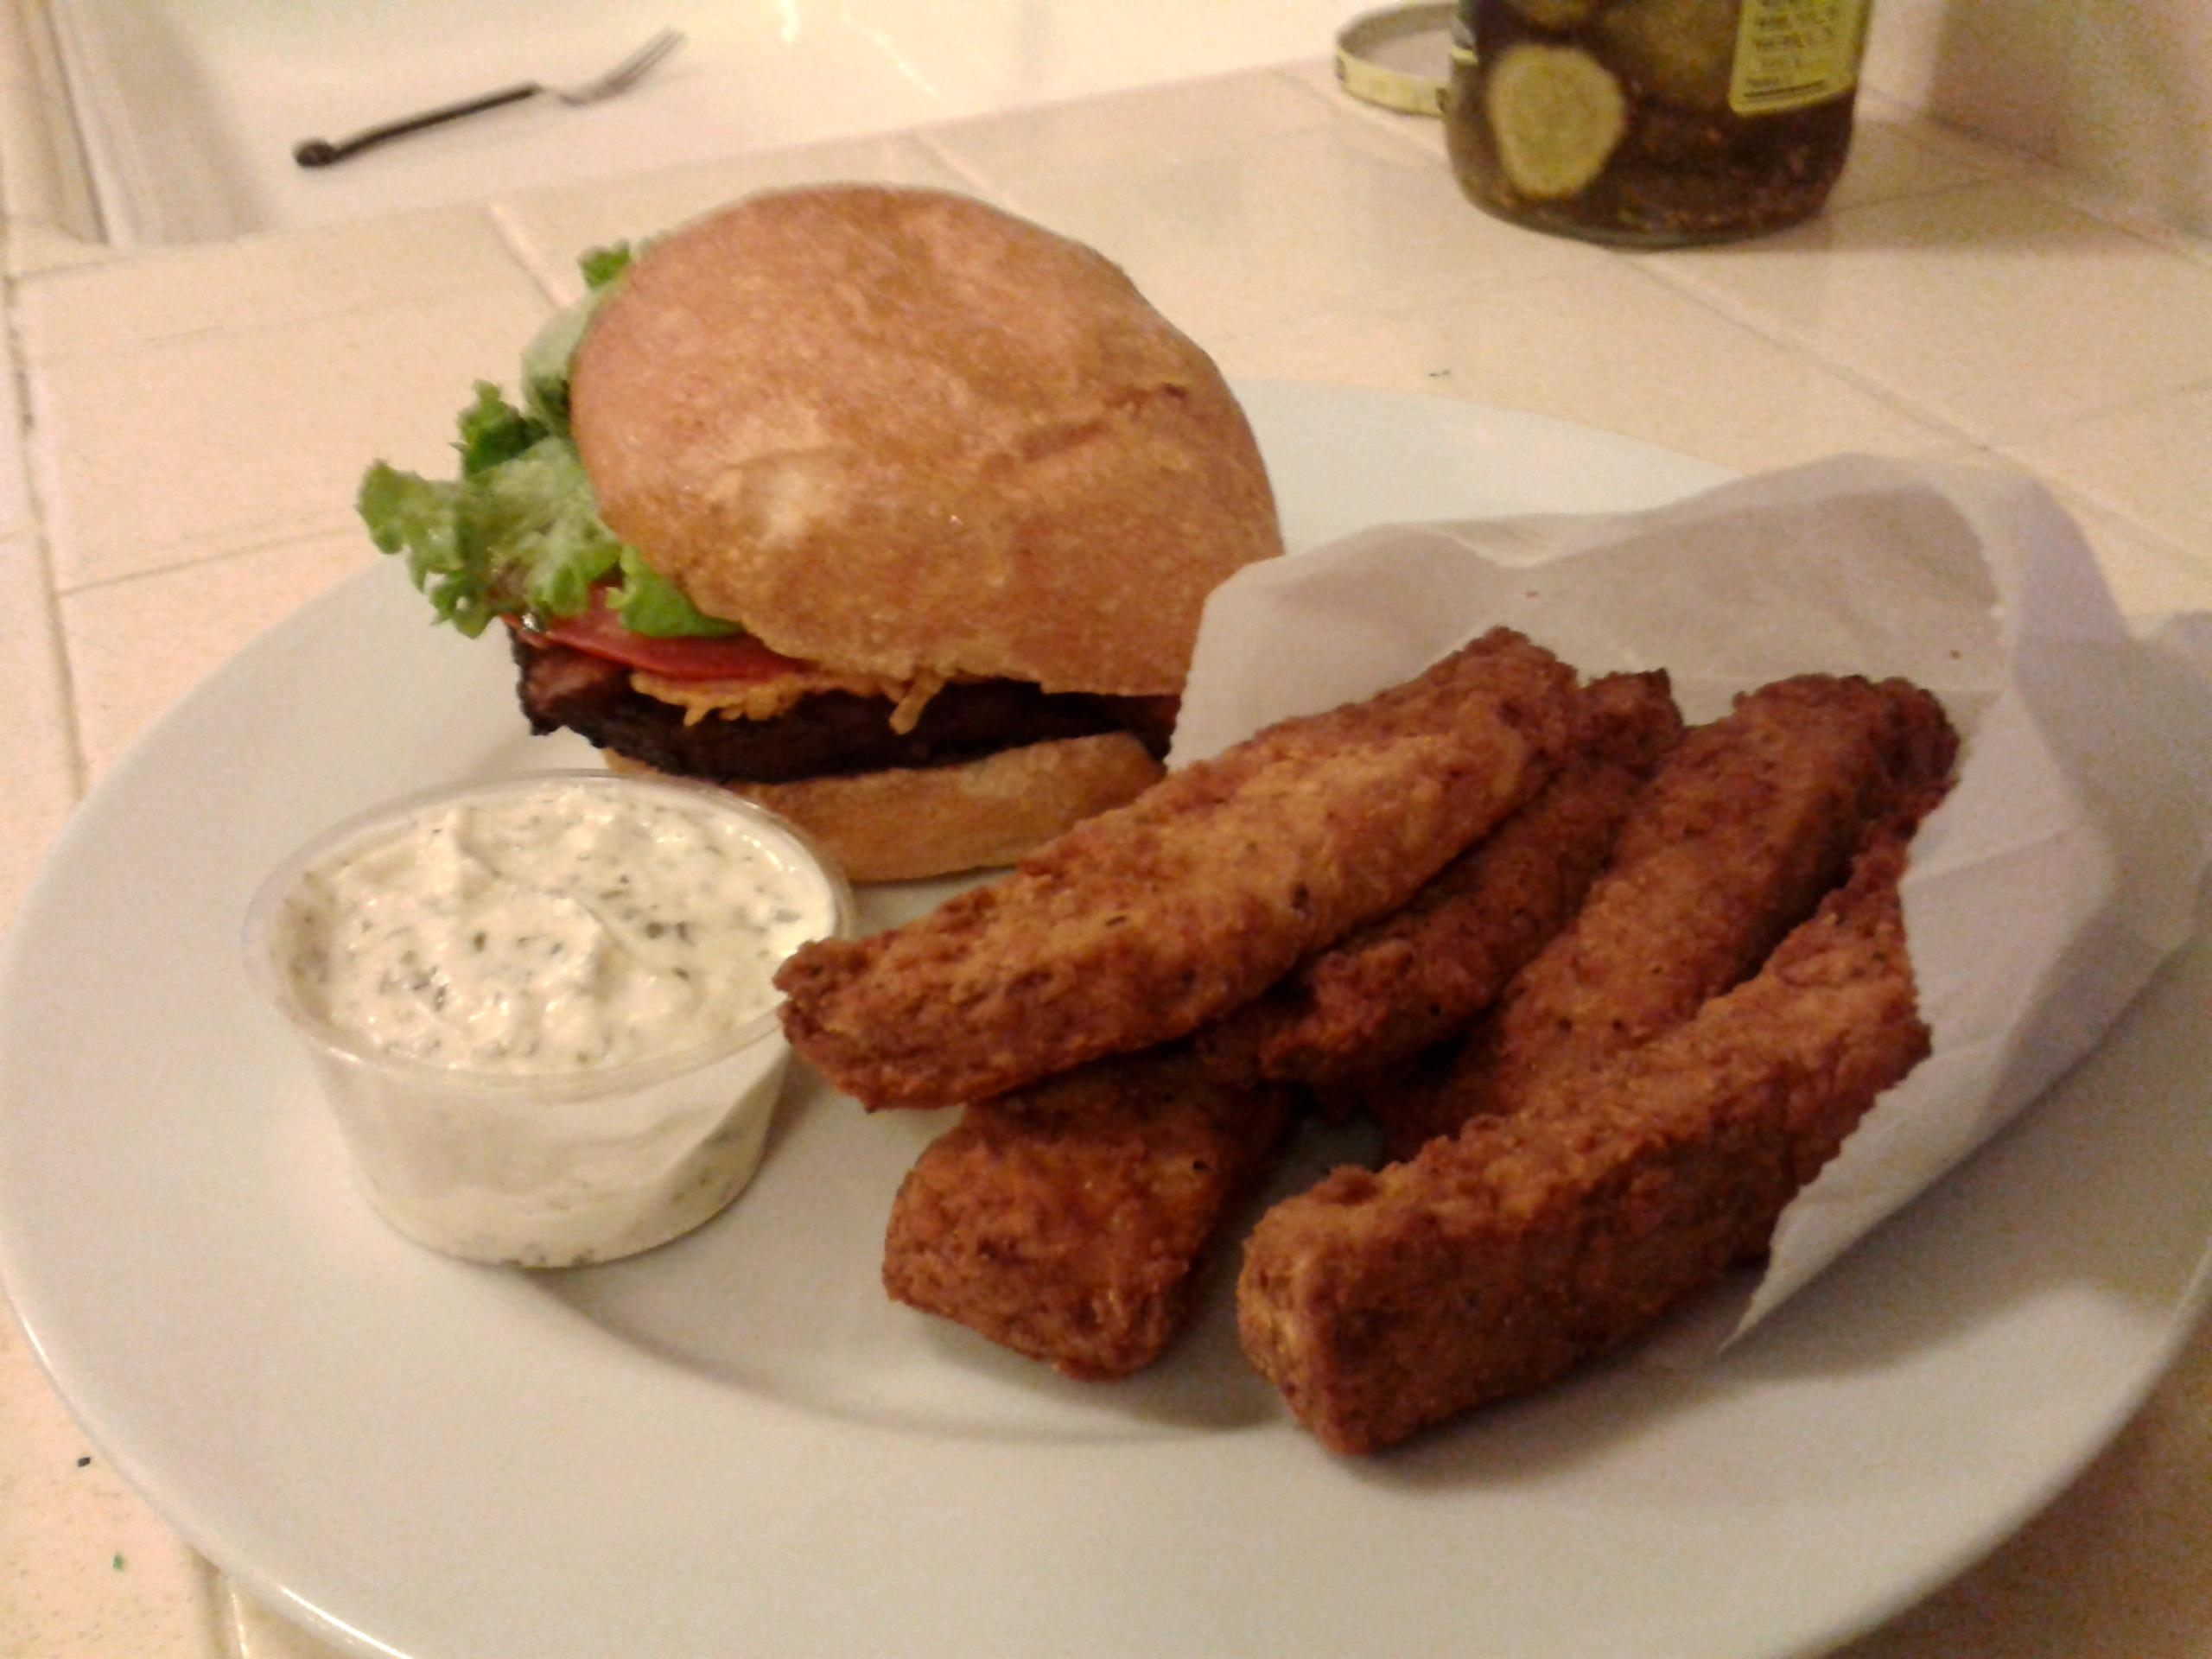 http://fatgayvegan.com/wp-content/uploads/2014/05/meal.jpg